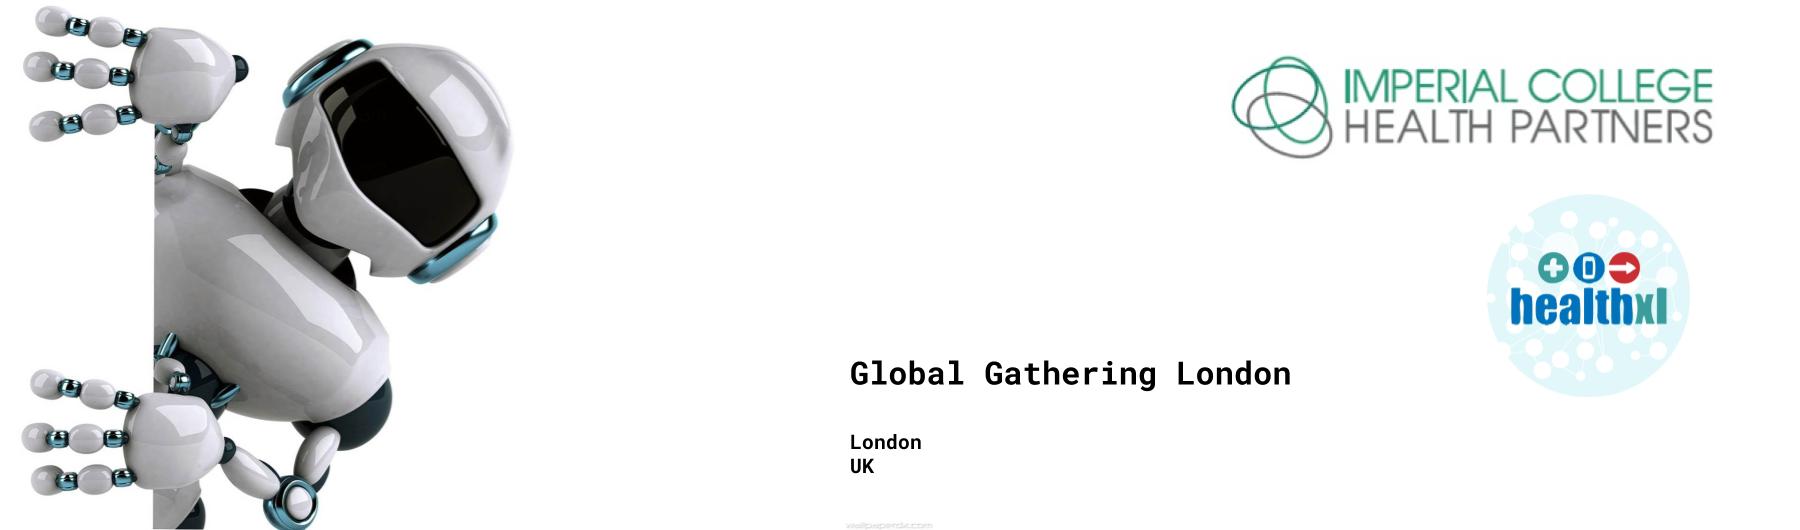 HealthXL Global Gathering in London